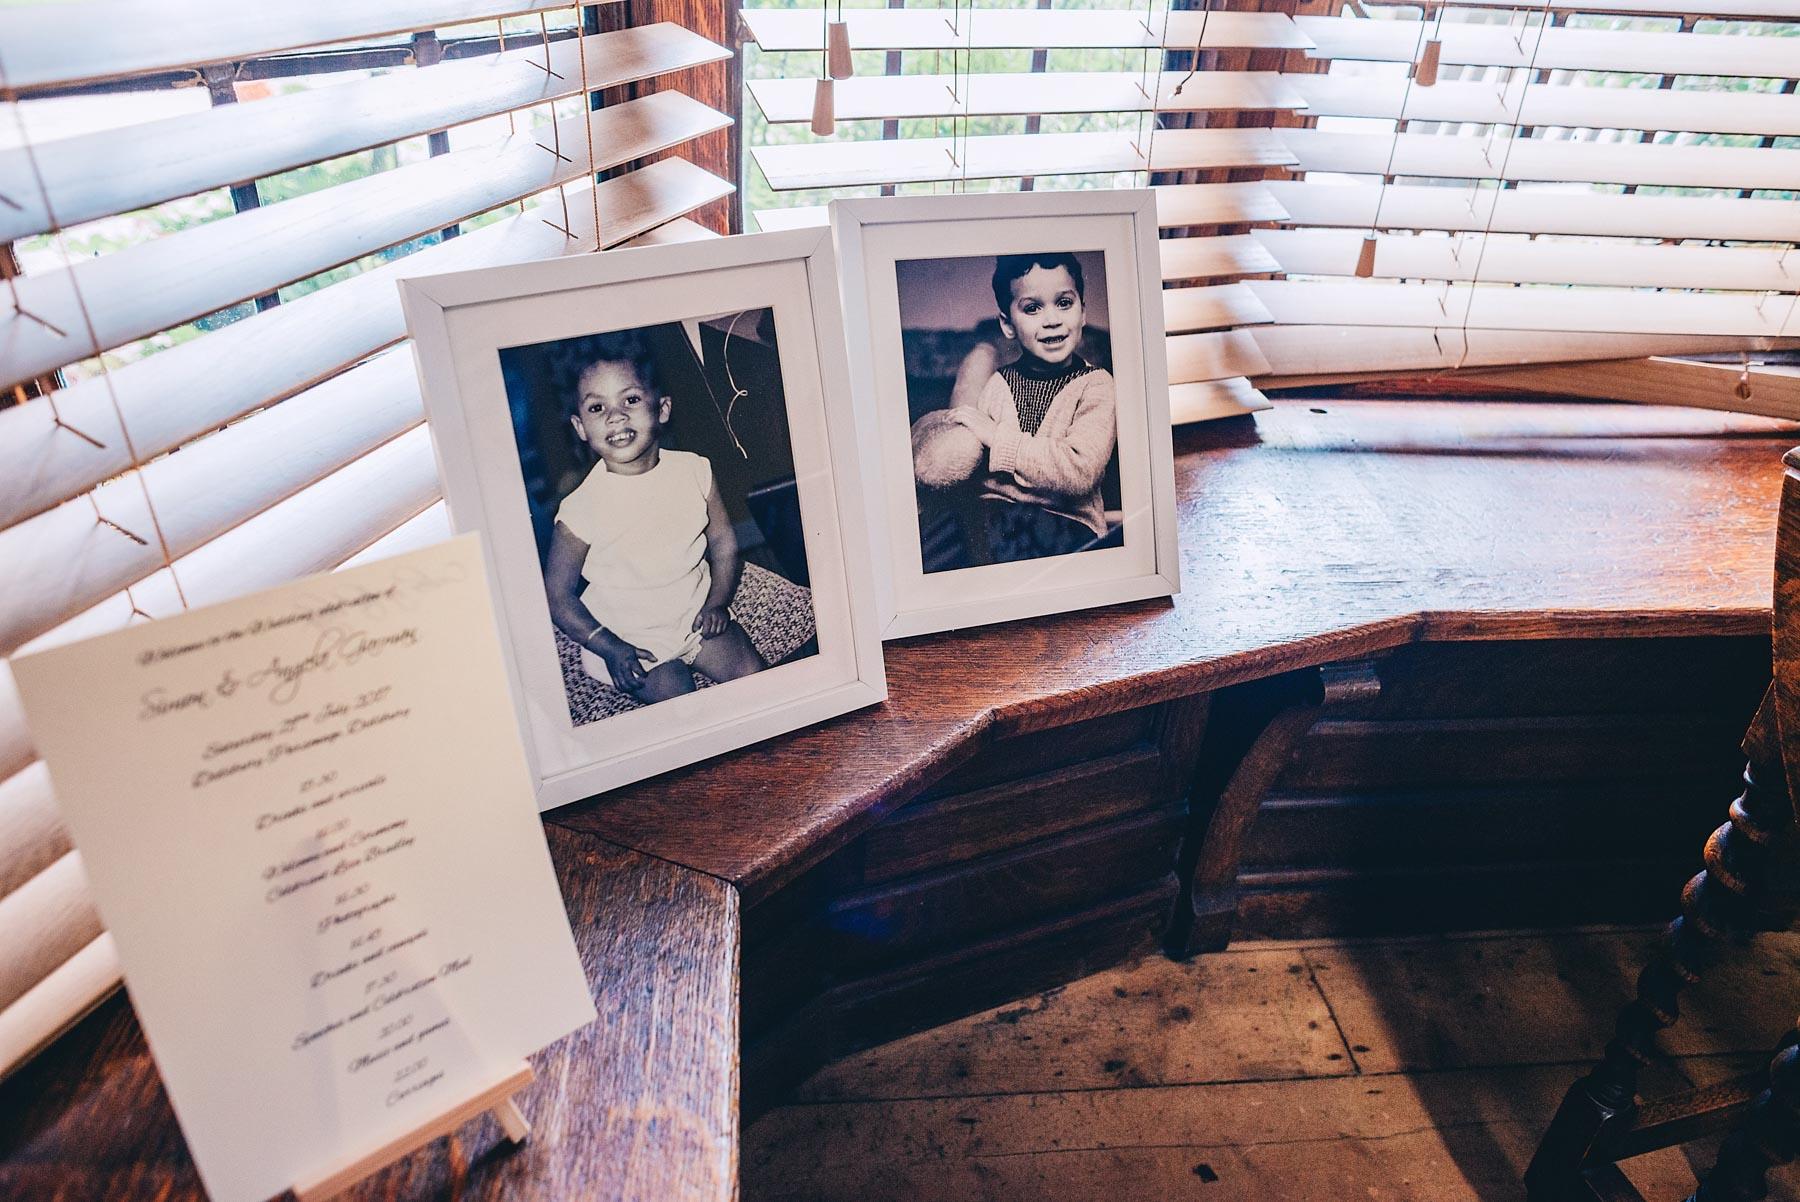 Old photos of family next to window